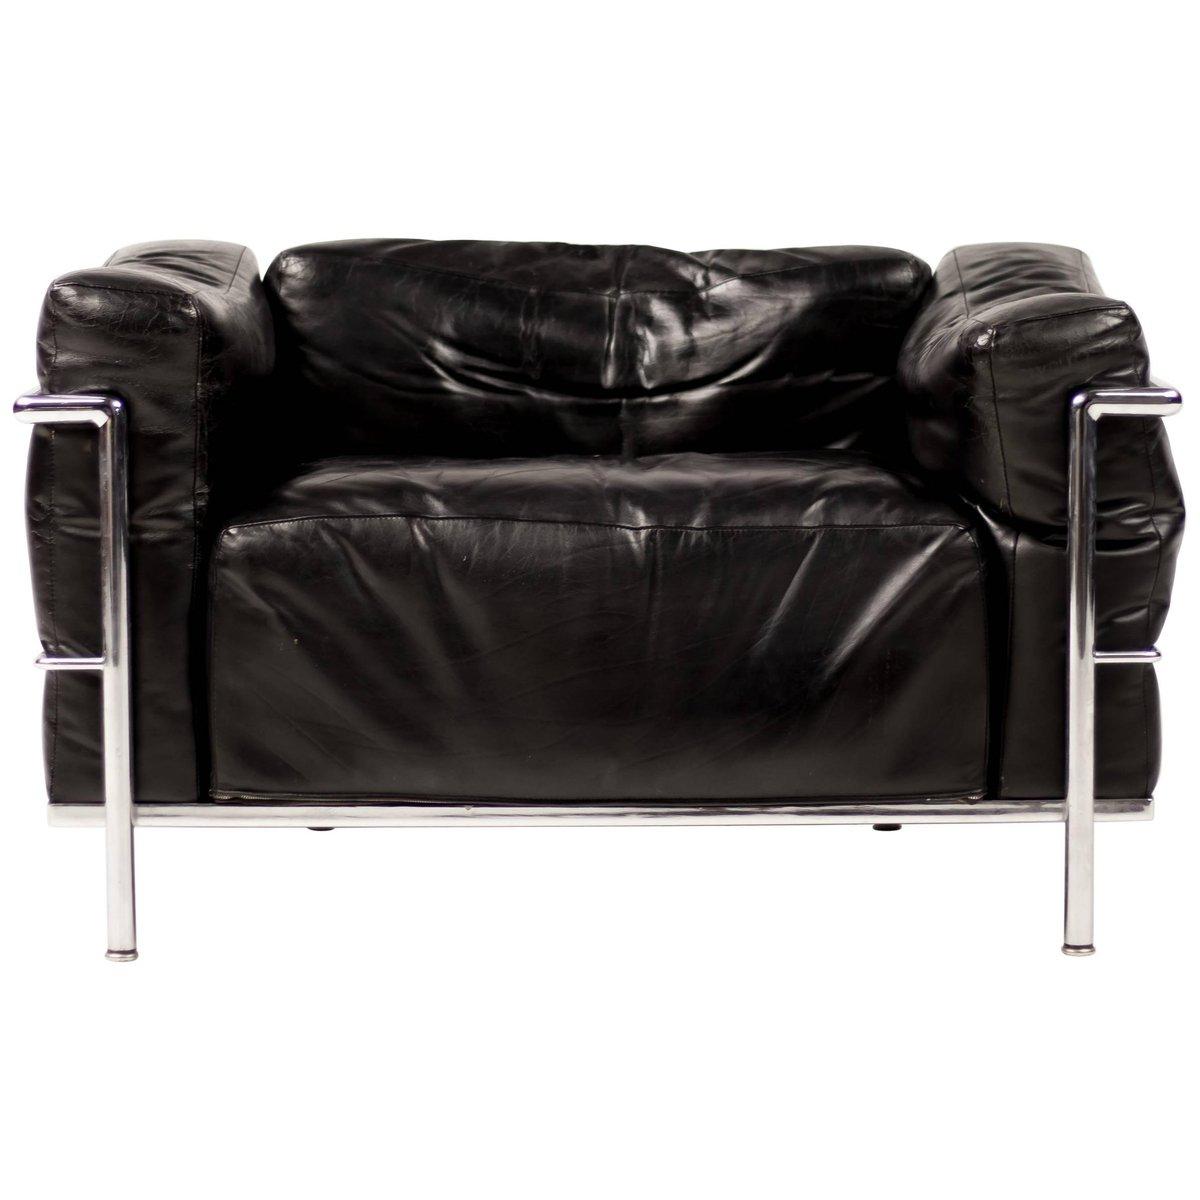 Corbusier Sessel Kaufen Corbusier Sessel Kaufen